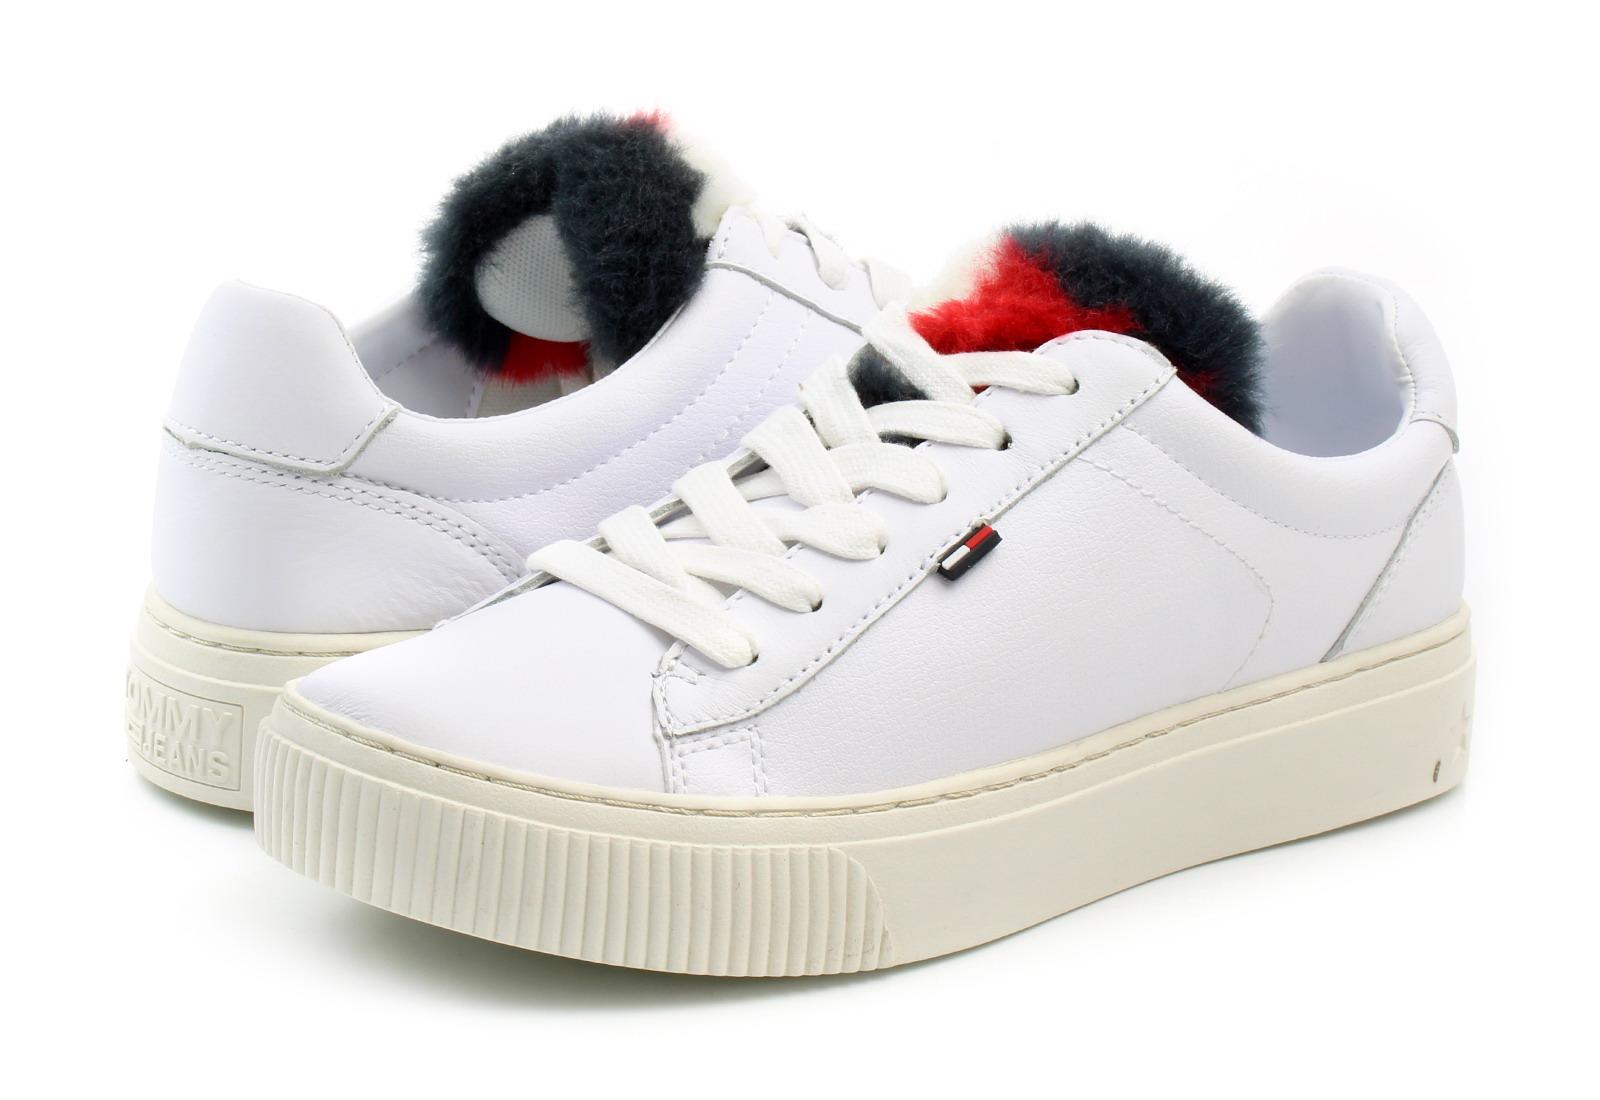 06d51db34eba6 Tommy Hilfiger Niske Cipele Bijele Cipele - Anita 7a - Office Shoes ...